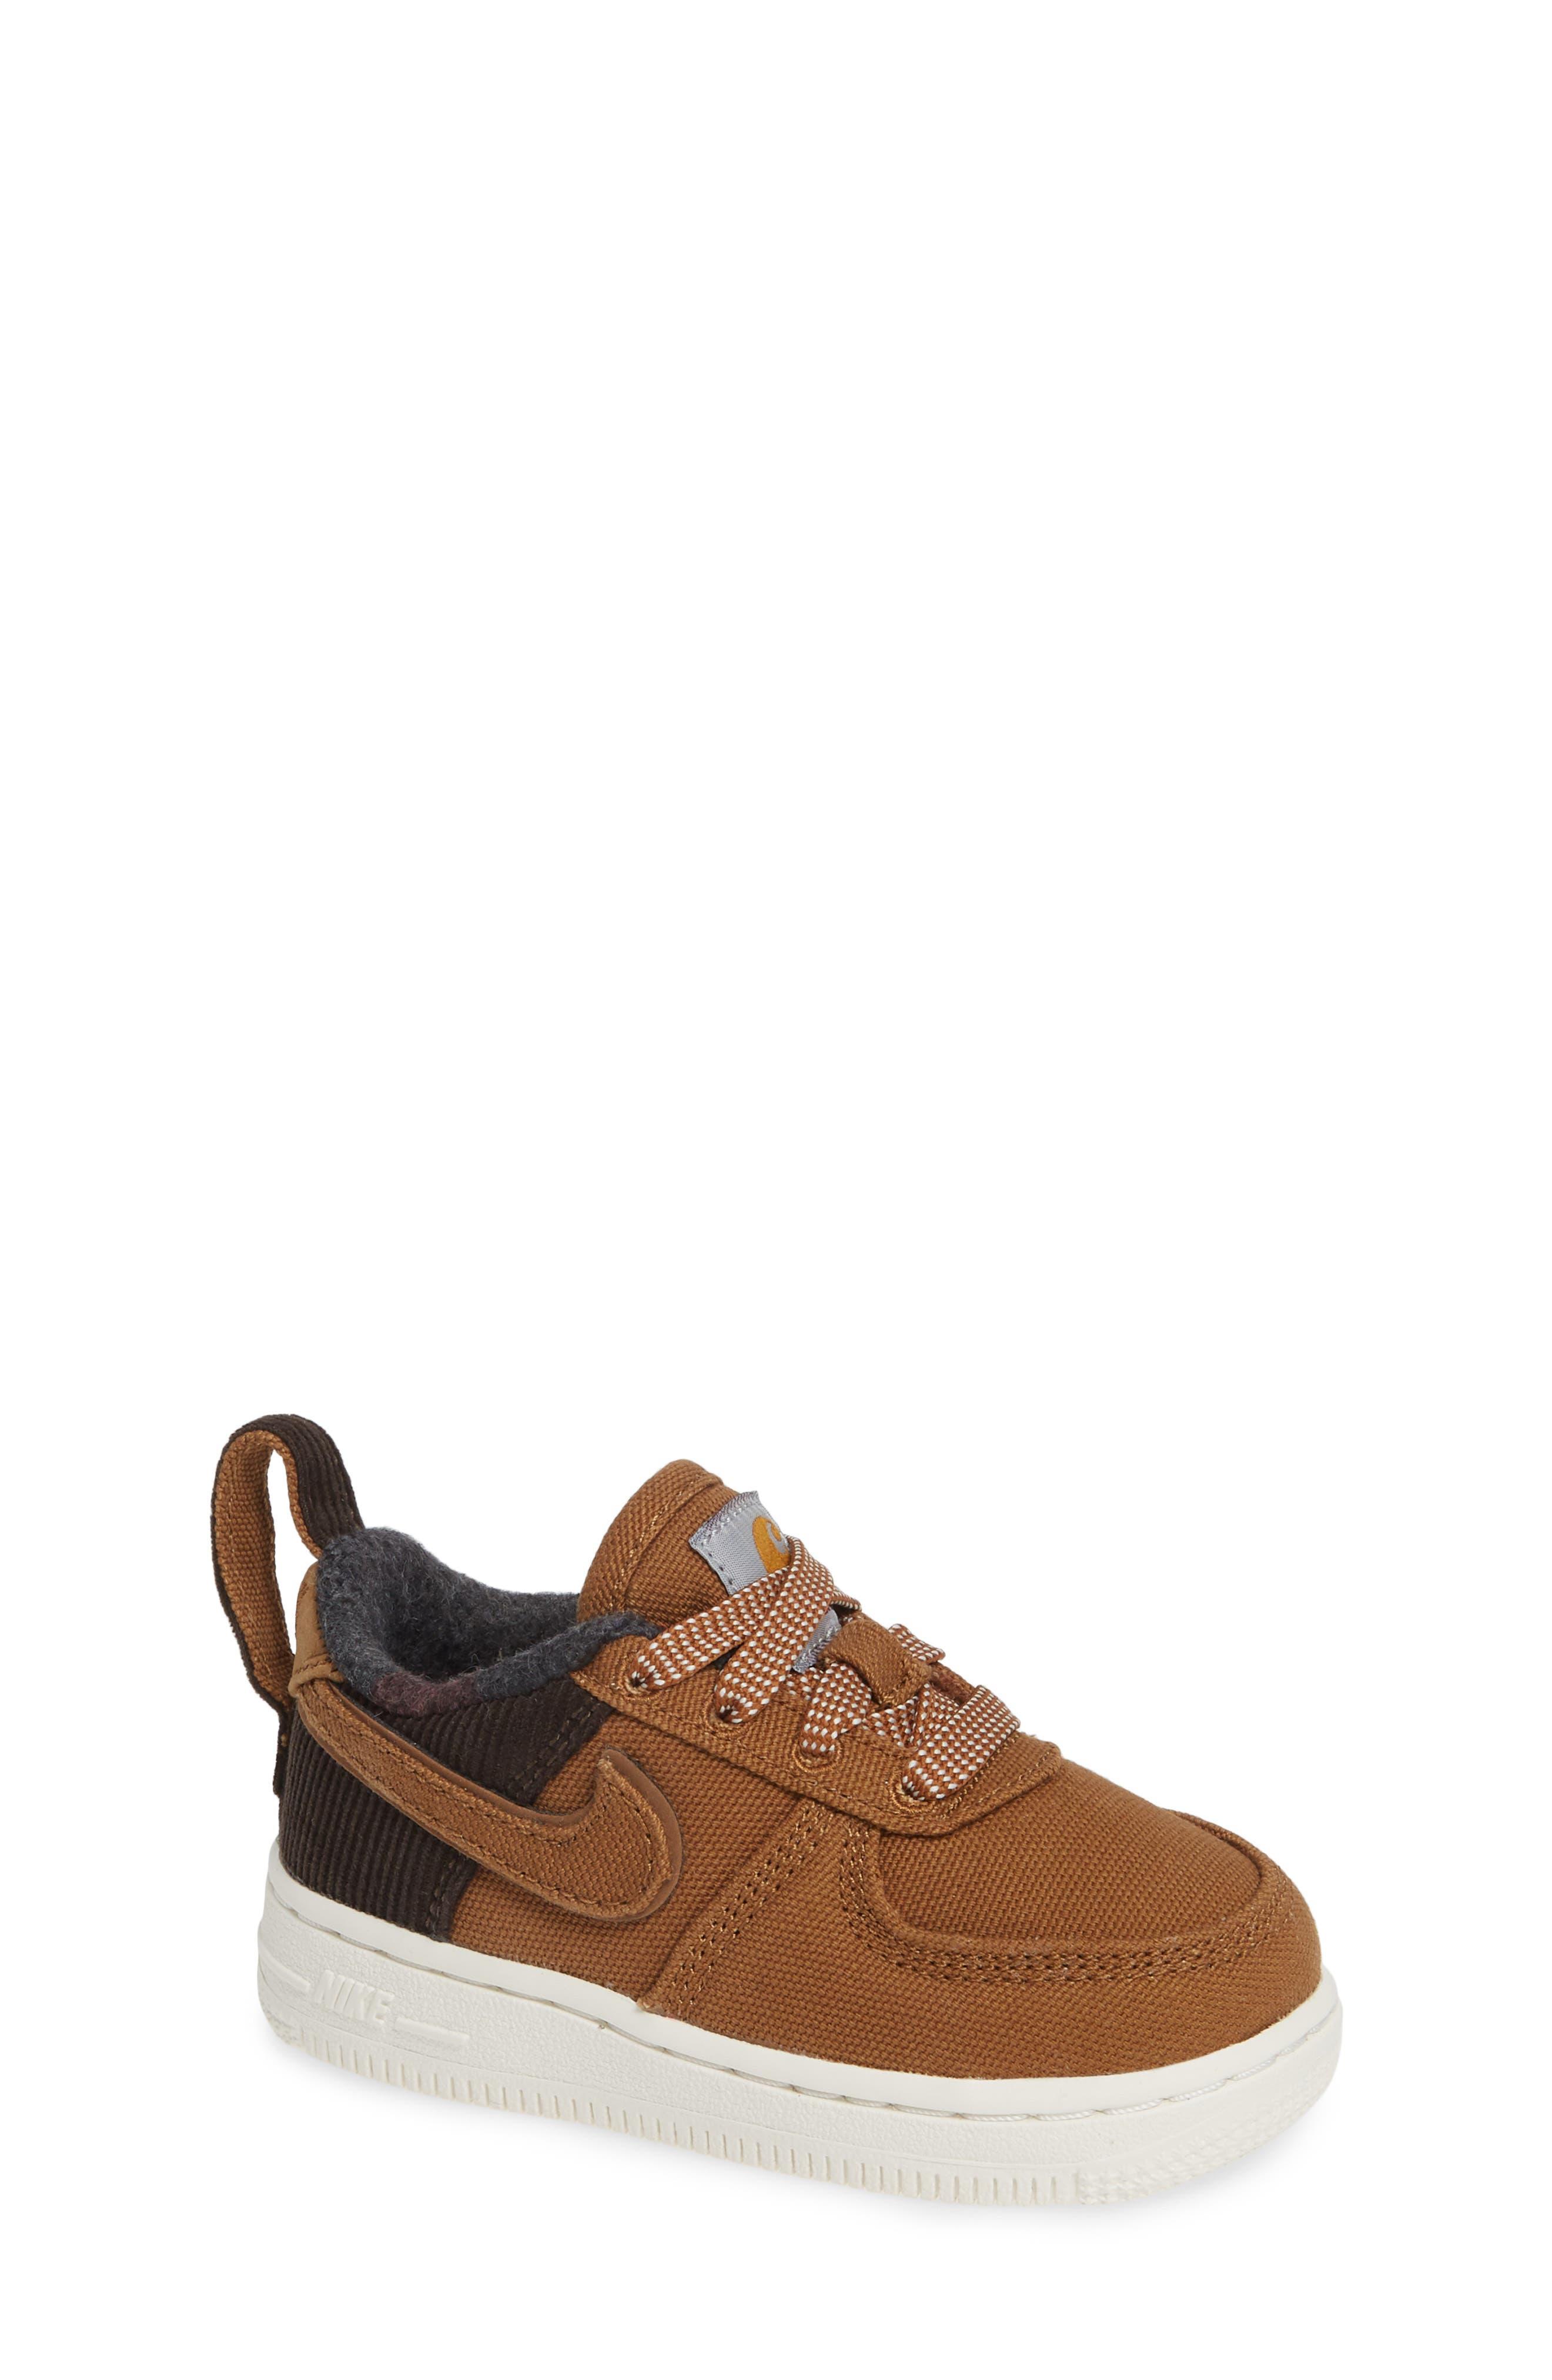 x Carhartt Air Force 1 Premium Sneaker, Main, color, ALE BROWN/ ALE BROWN-SAIL